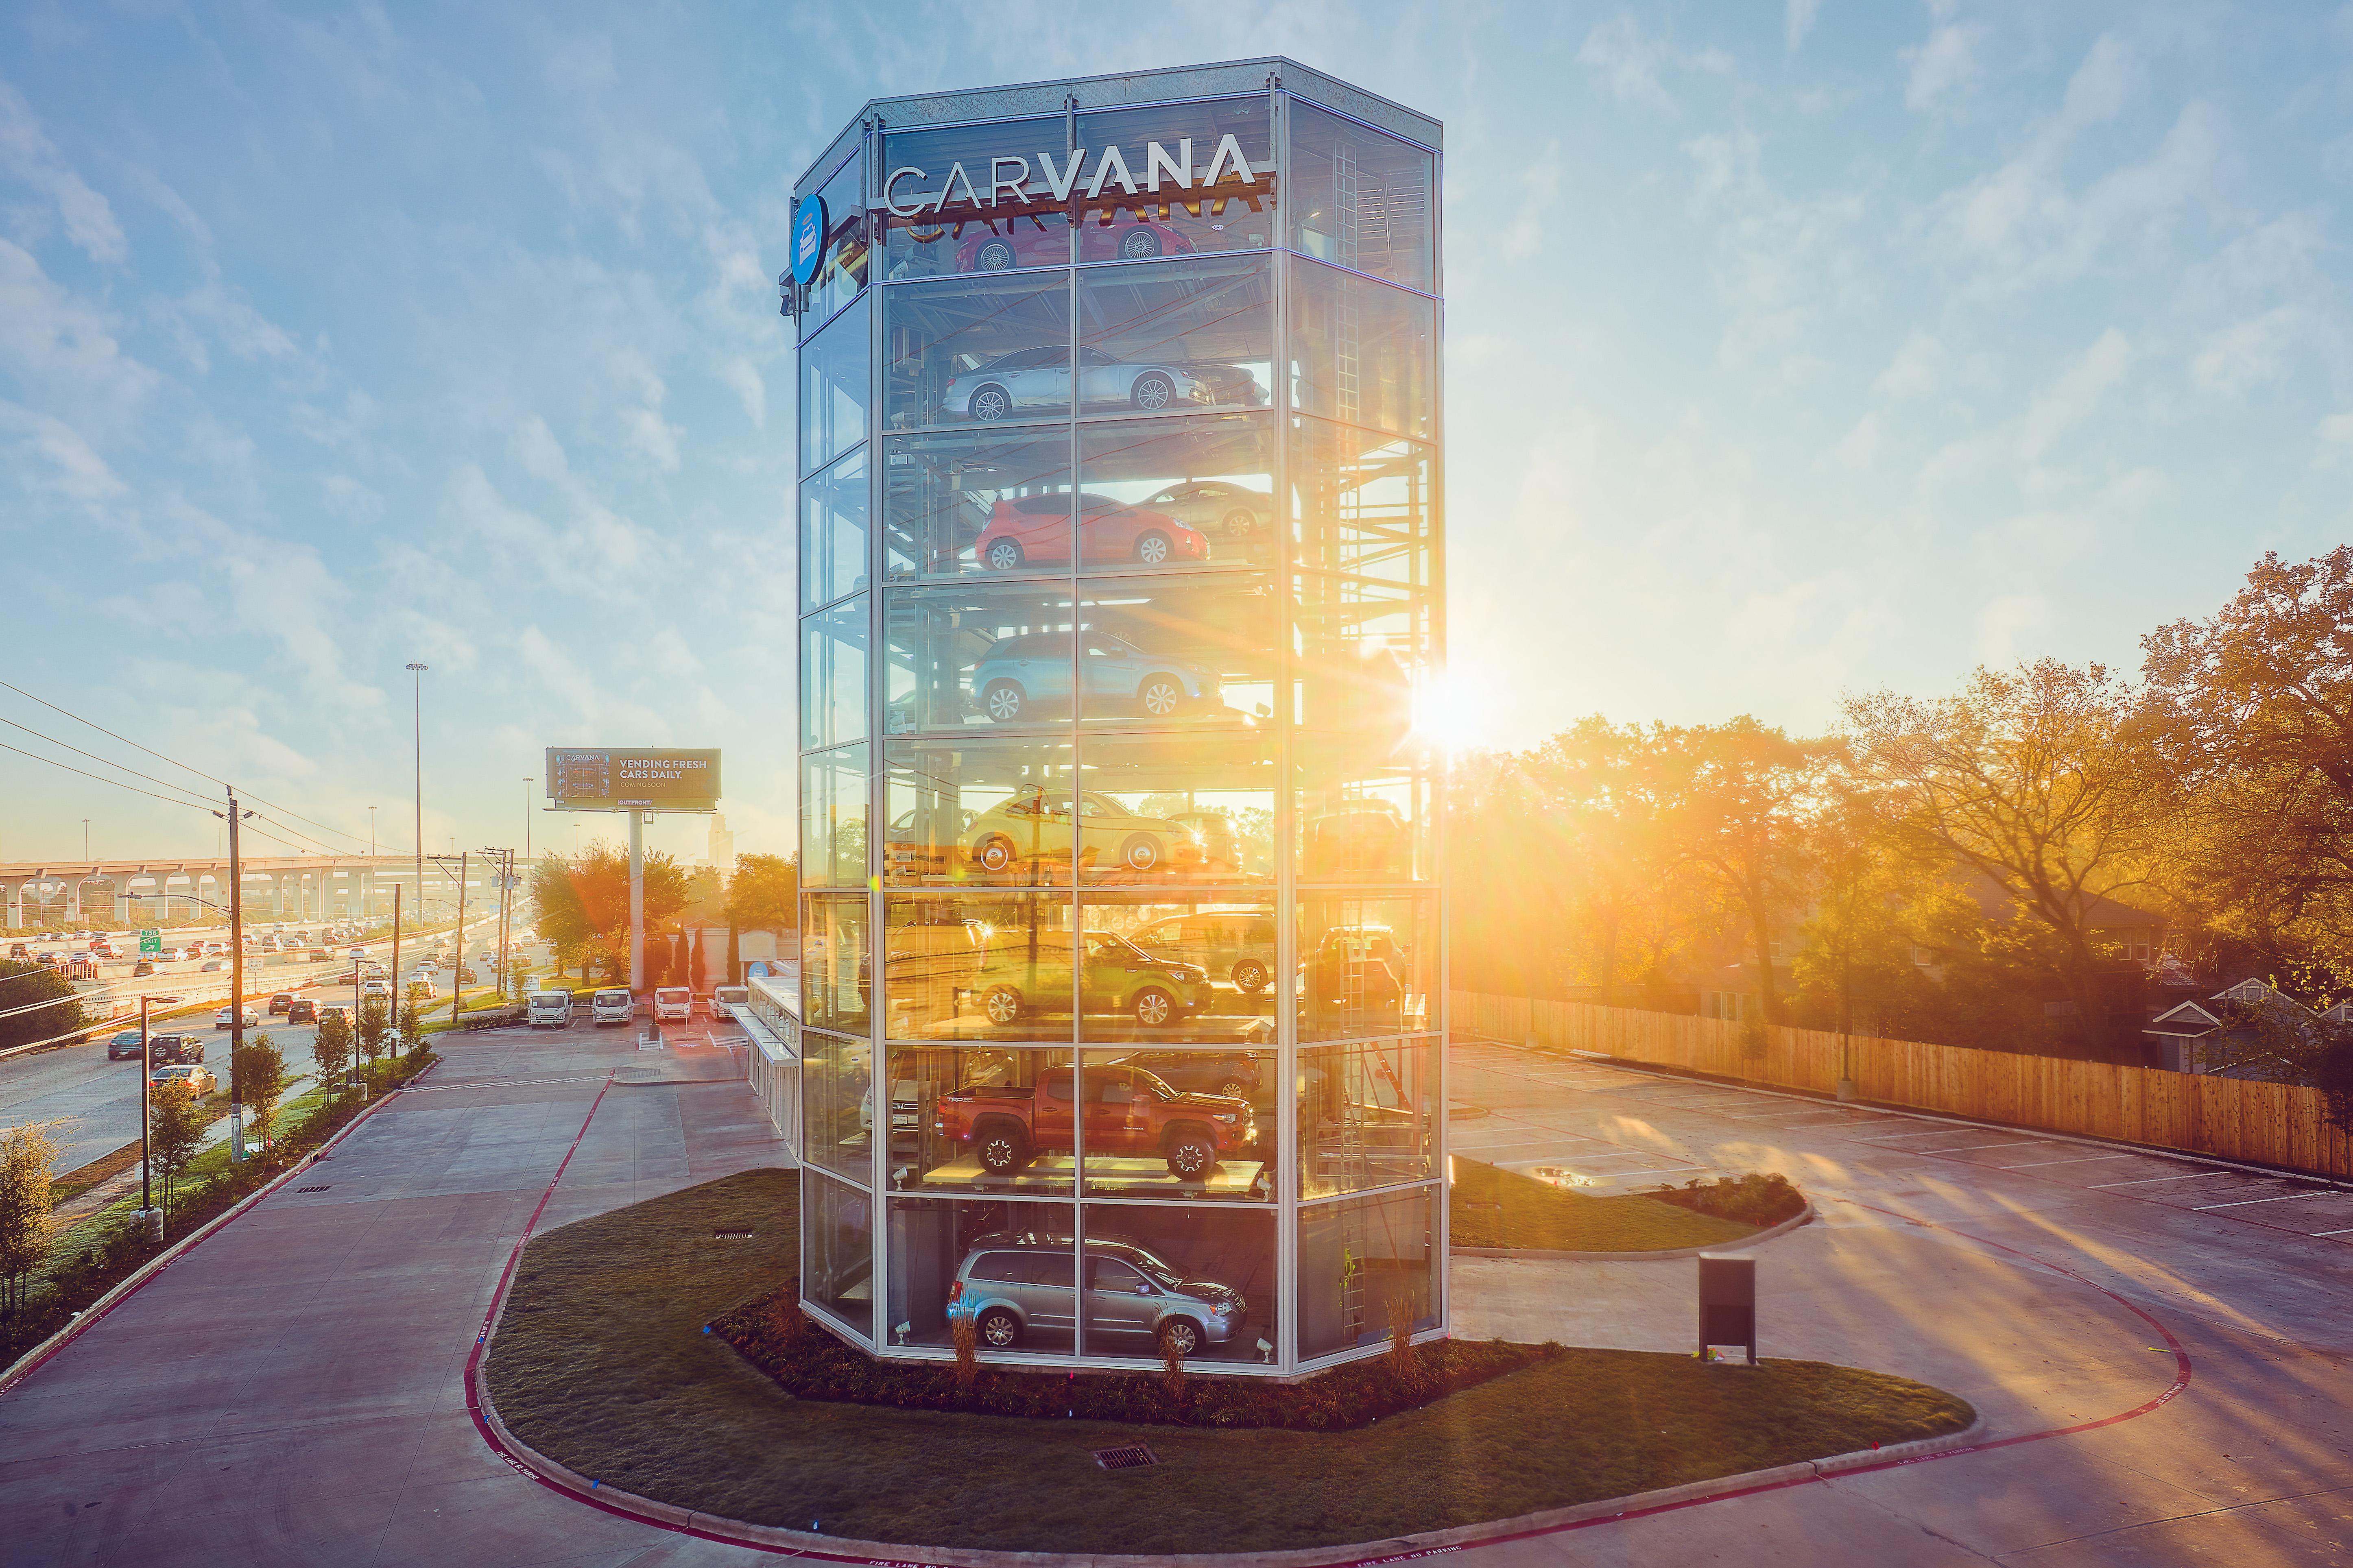 Carvana's eight-story vehicle vending machine, shown at sunrise (or sunset?)